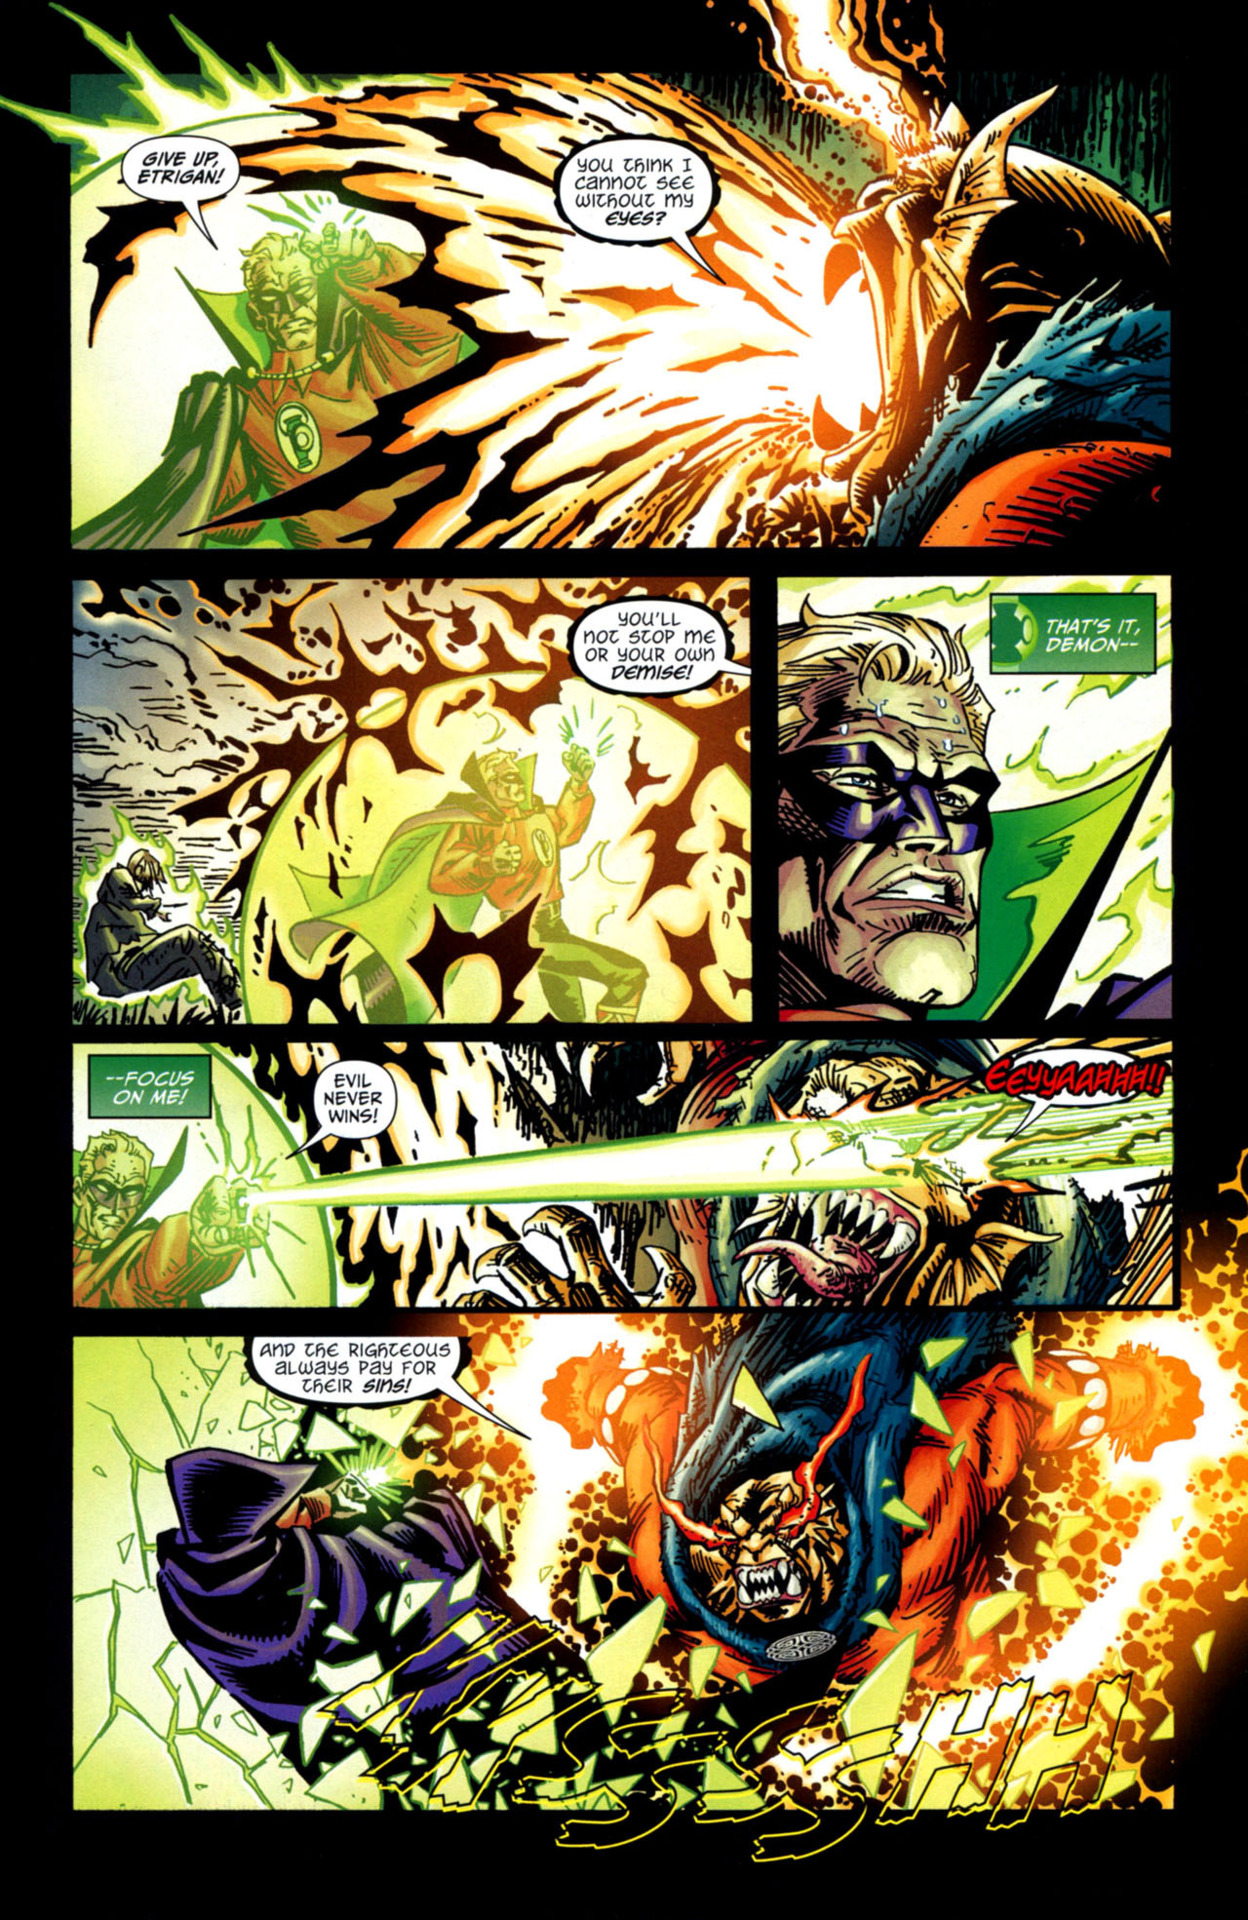 Breaks through the most powerful Green Lantern's defense shield